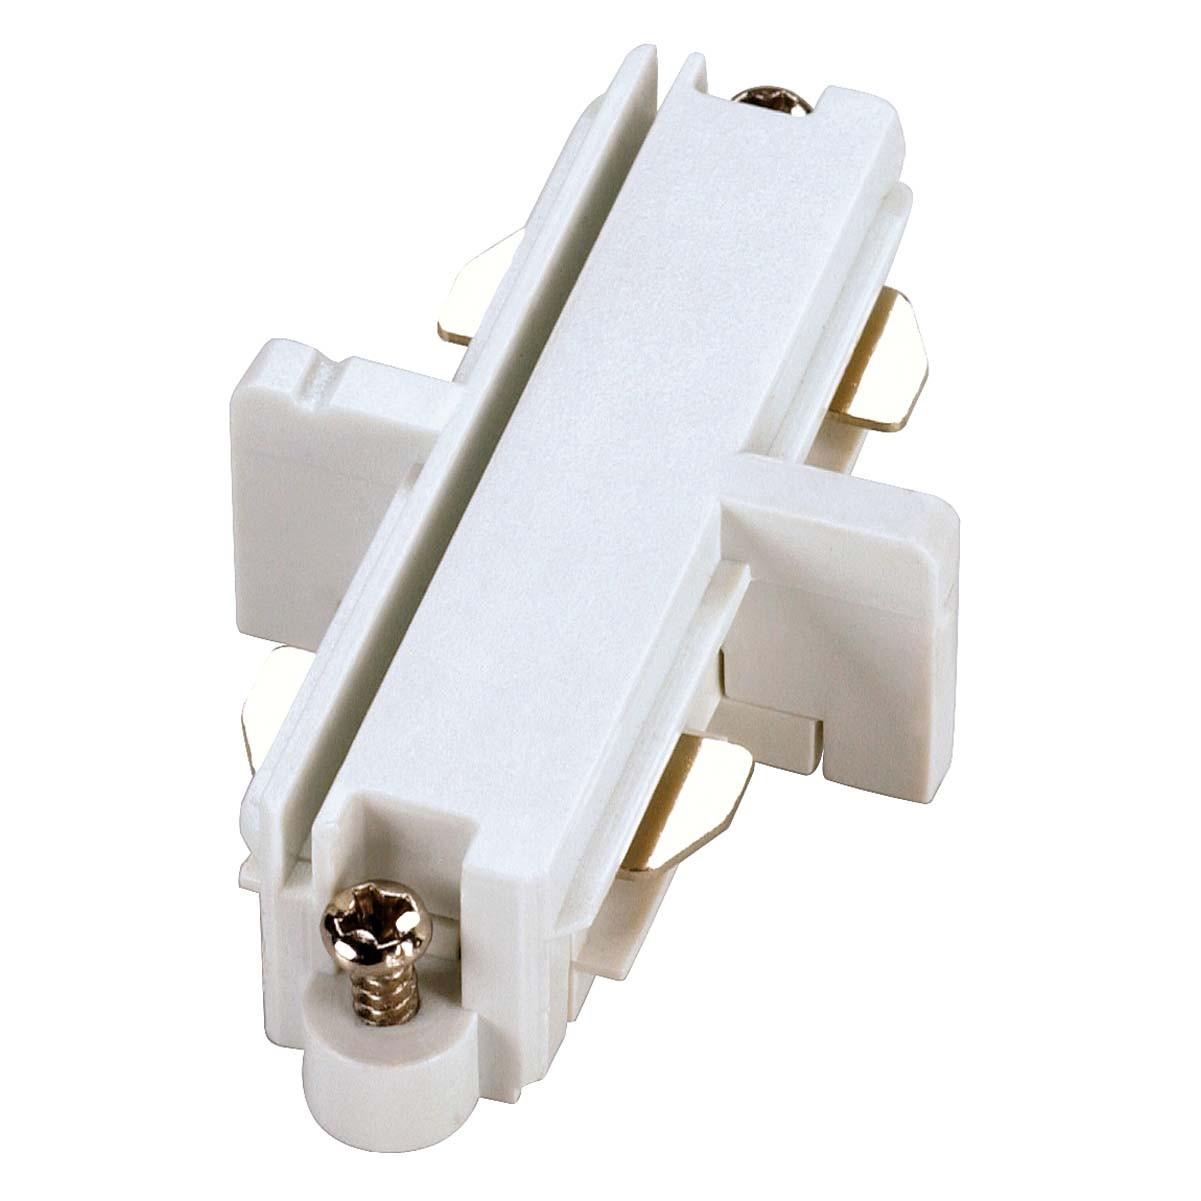 SLV 143091 Straight Coupler White 1 Circuit 240V Track Accessory